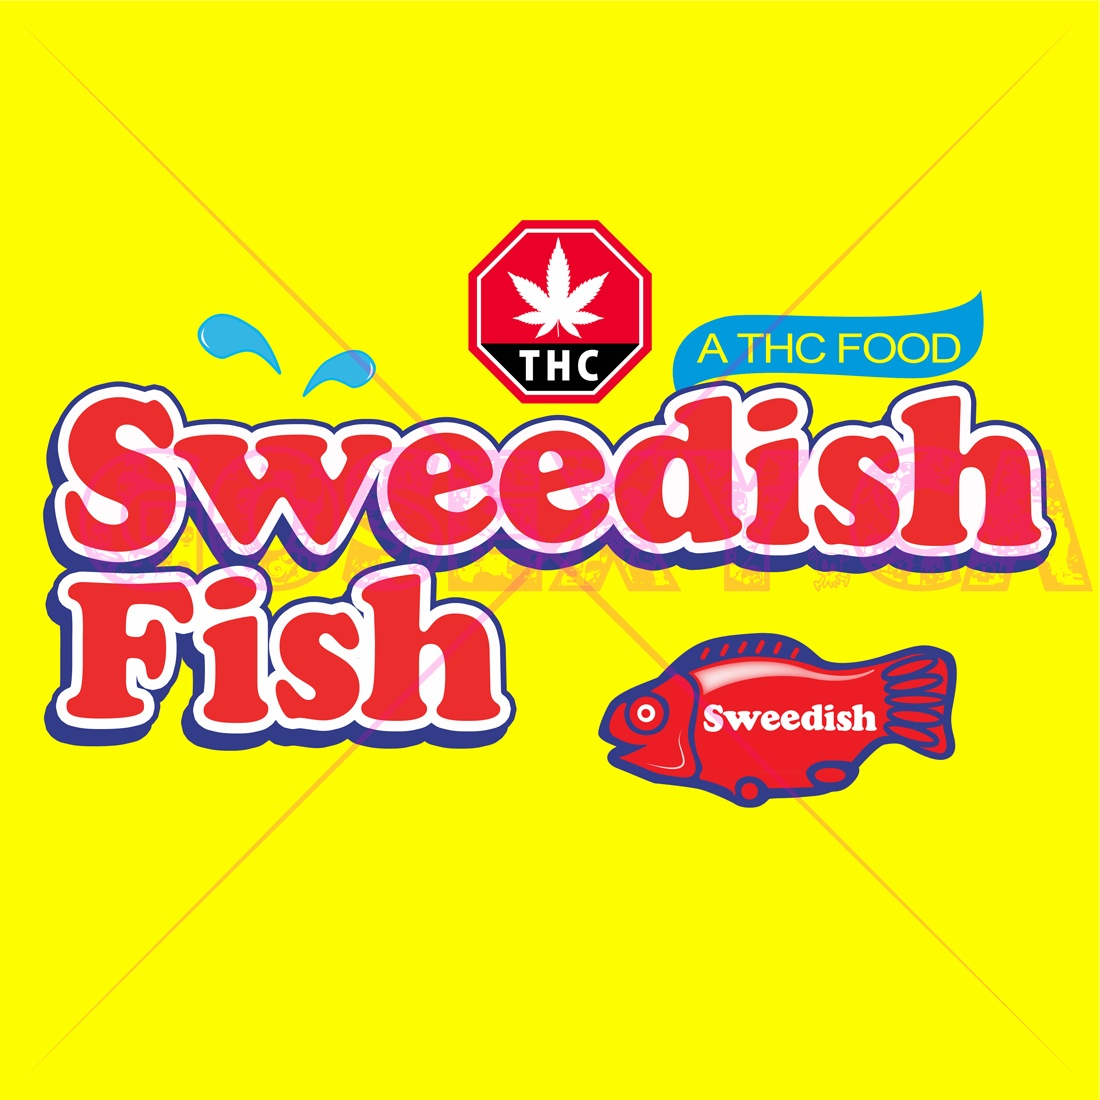 https://0901.nccdn.net/4_2/000/000/011/751/SWEEDISH-FISH-GOSEXYCA-1100x1100.jpg